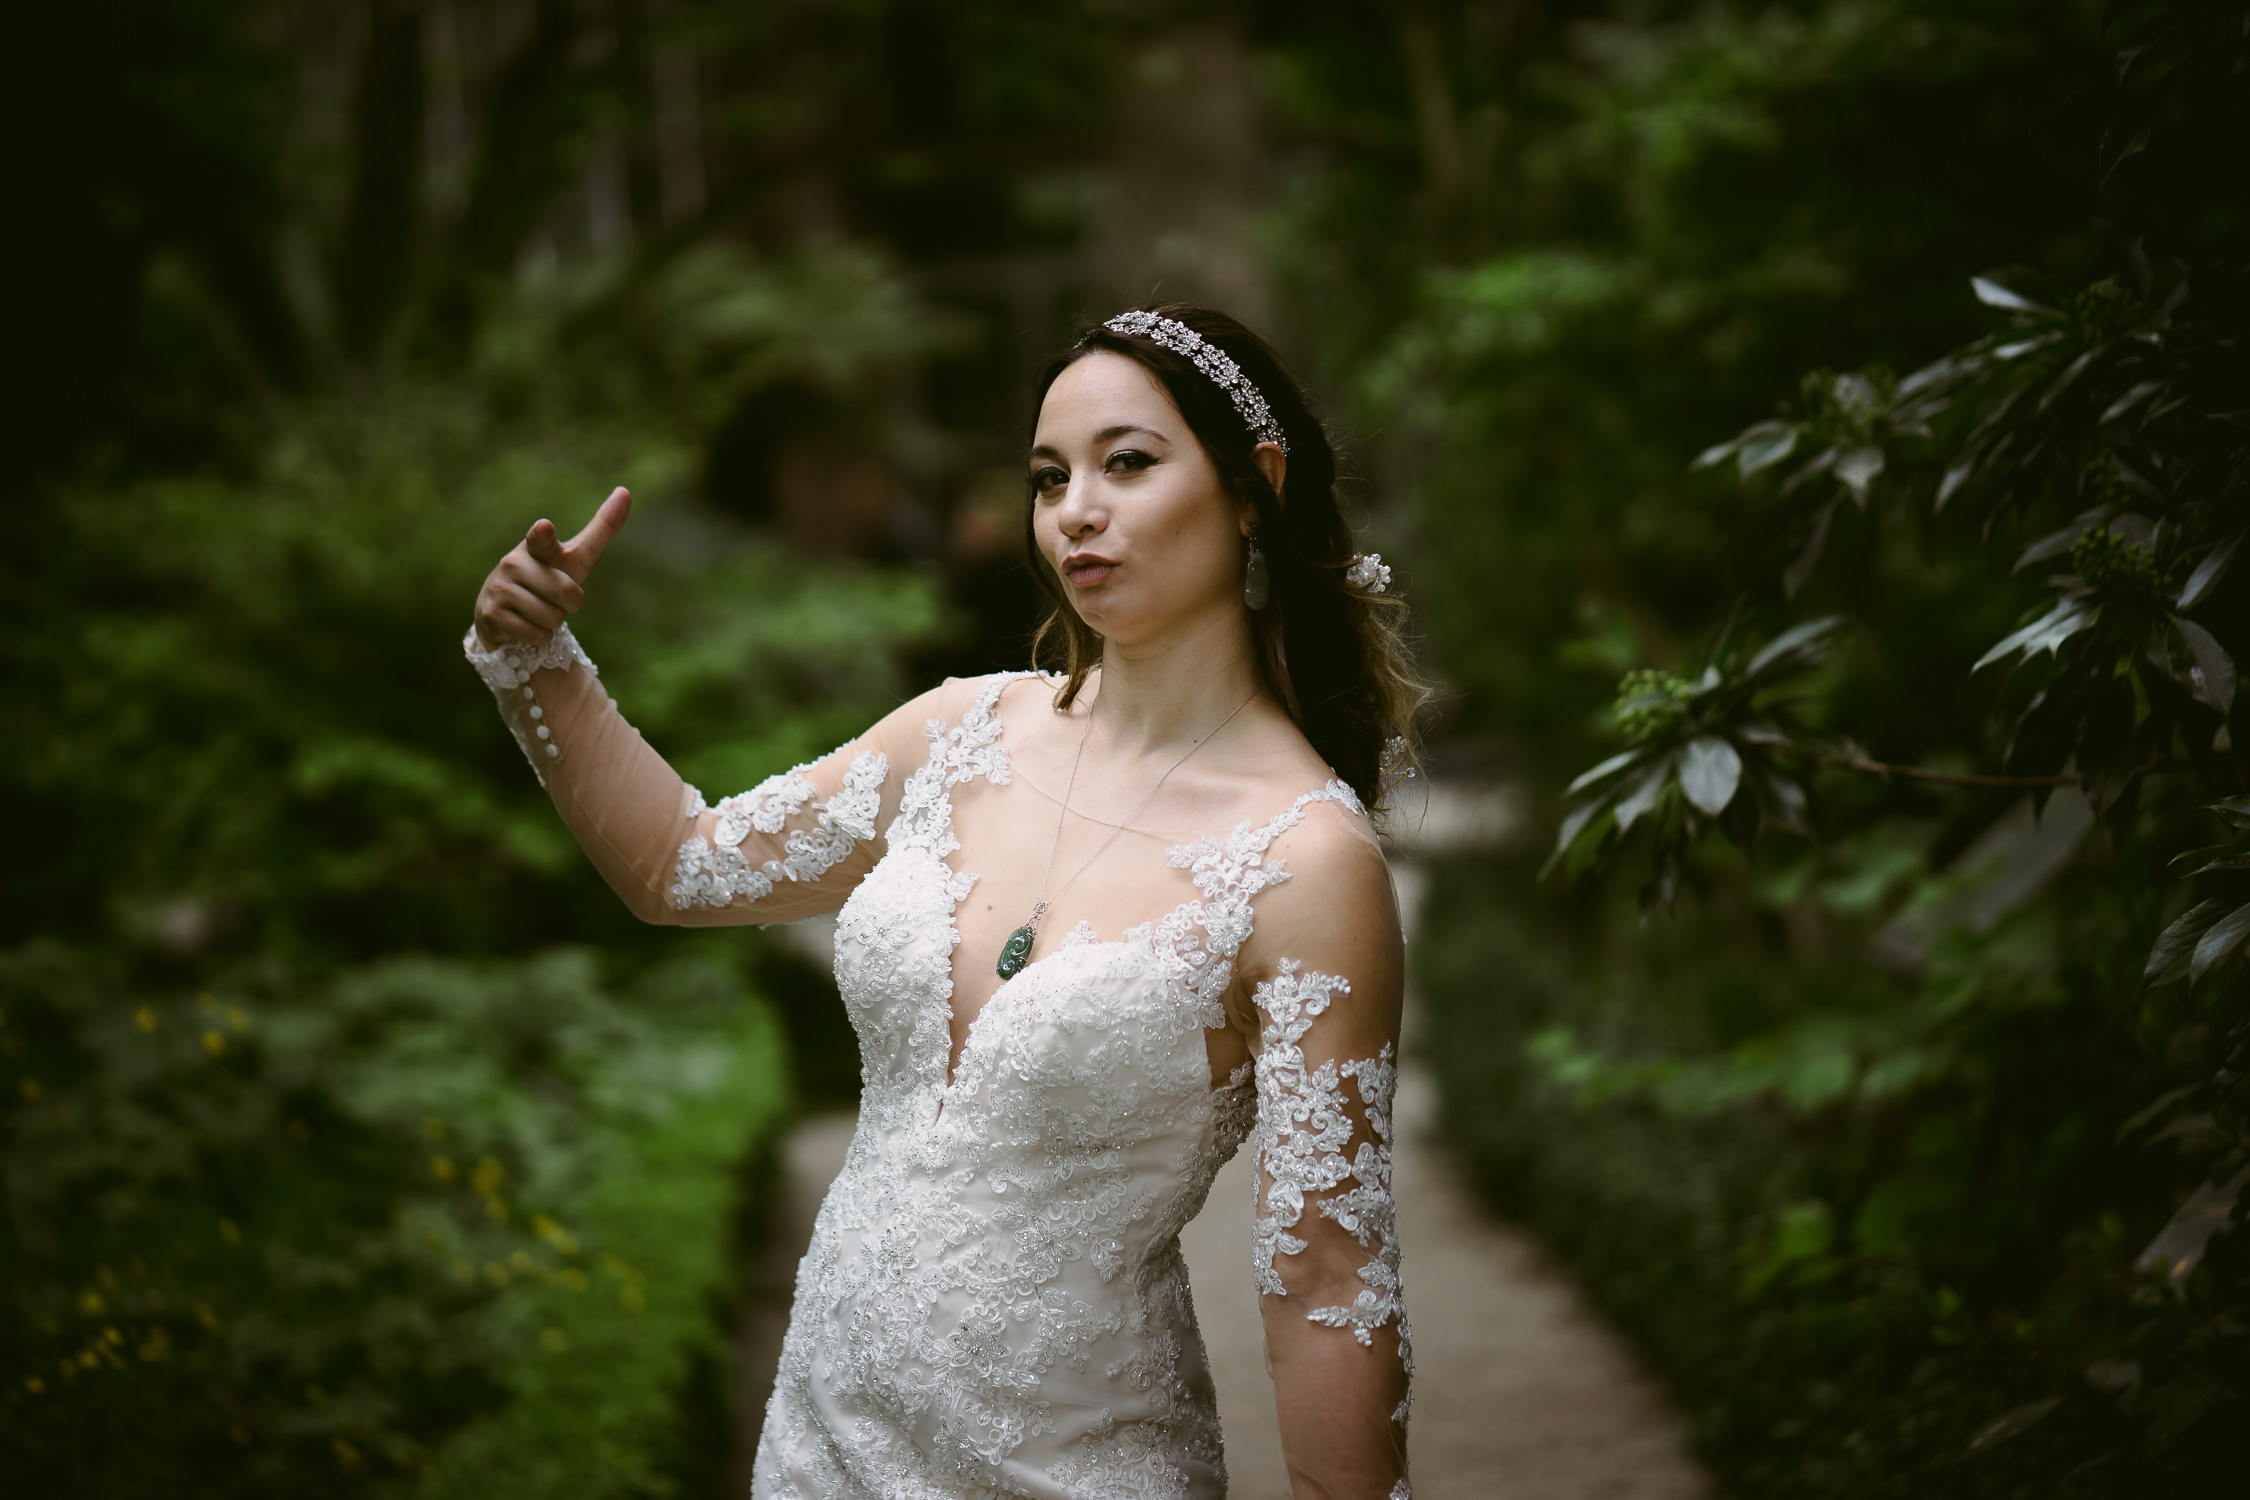 bruidsfotografie-amsterdam-utrecht-trouwfotograaf-mark-hadden-wedding-photography-Robin & Guus-041.jpg